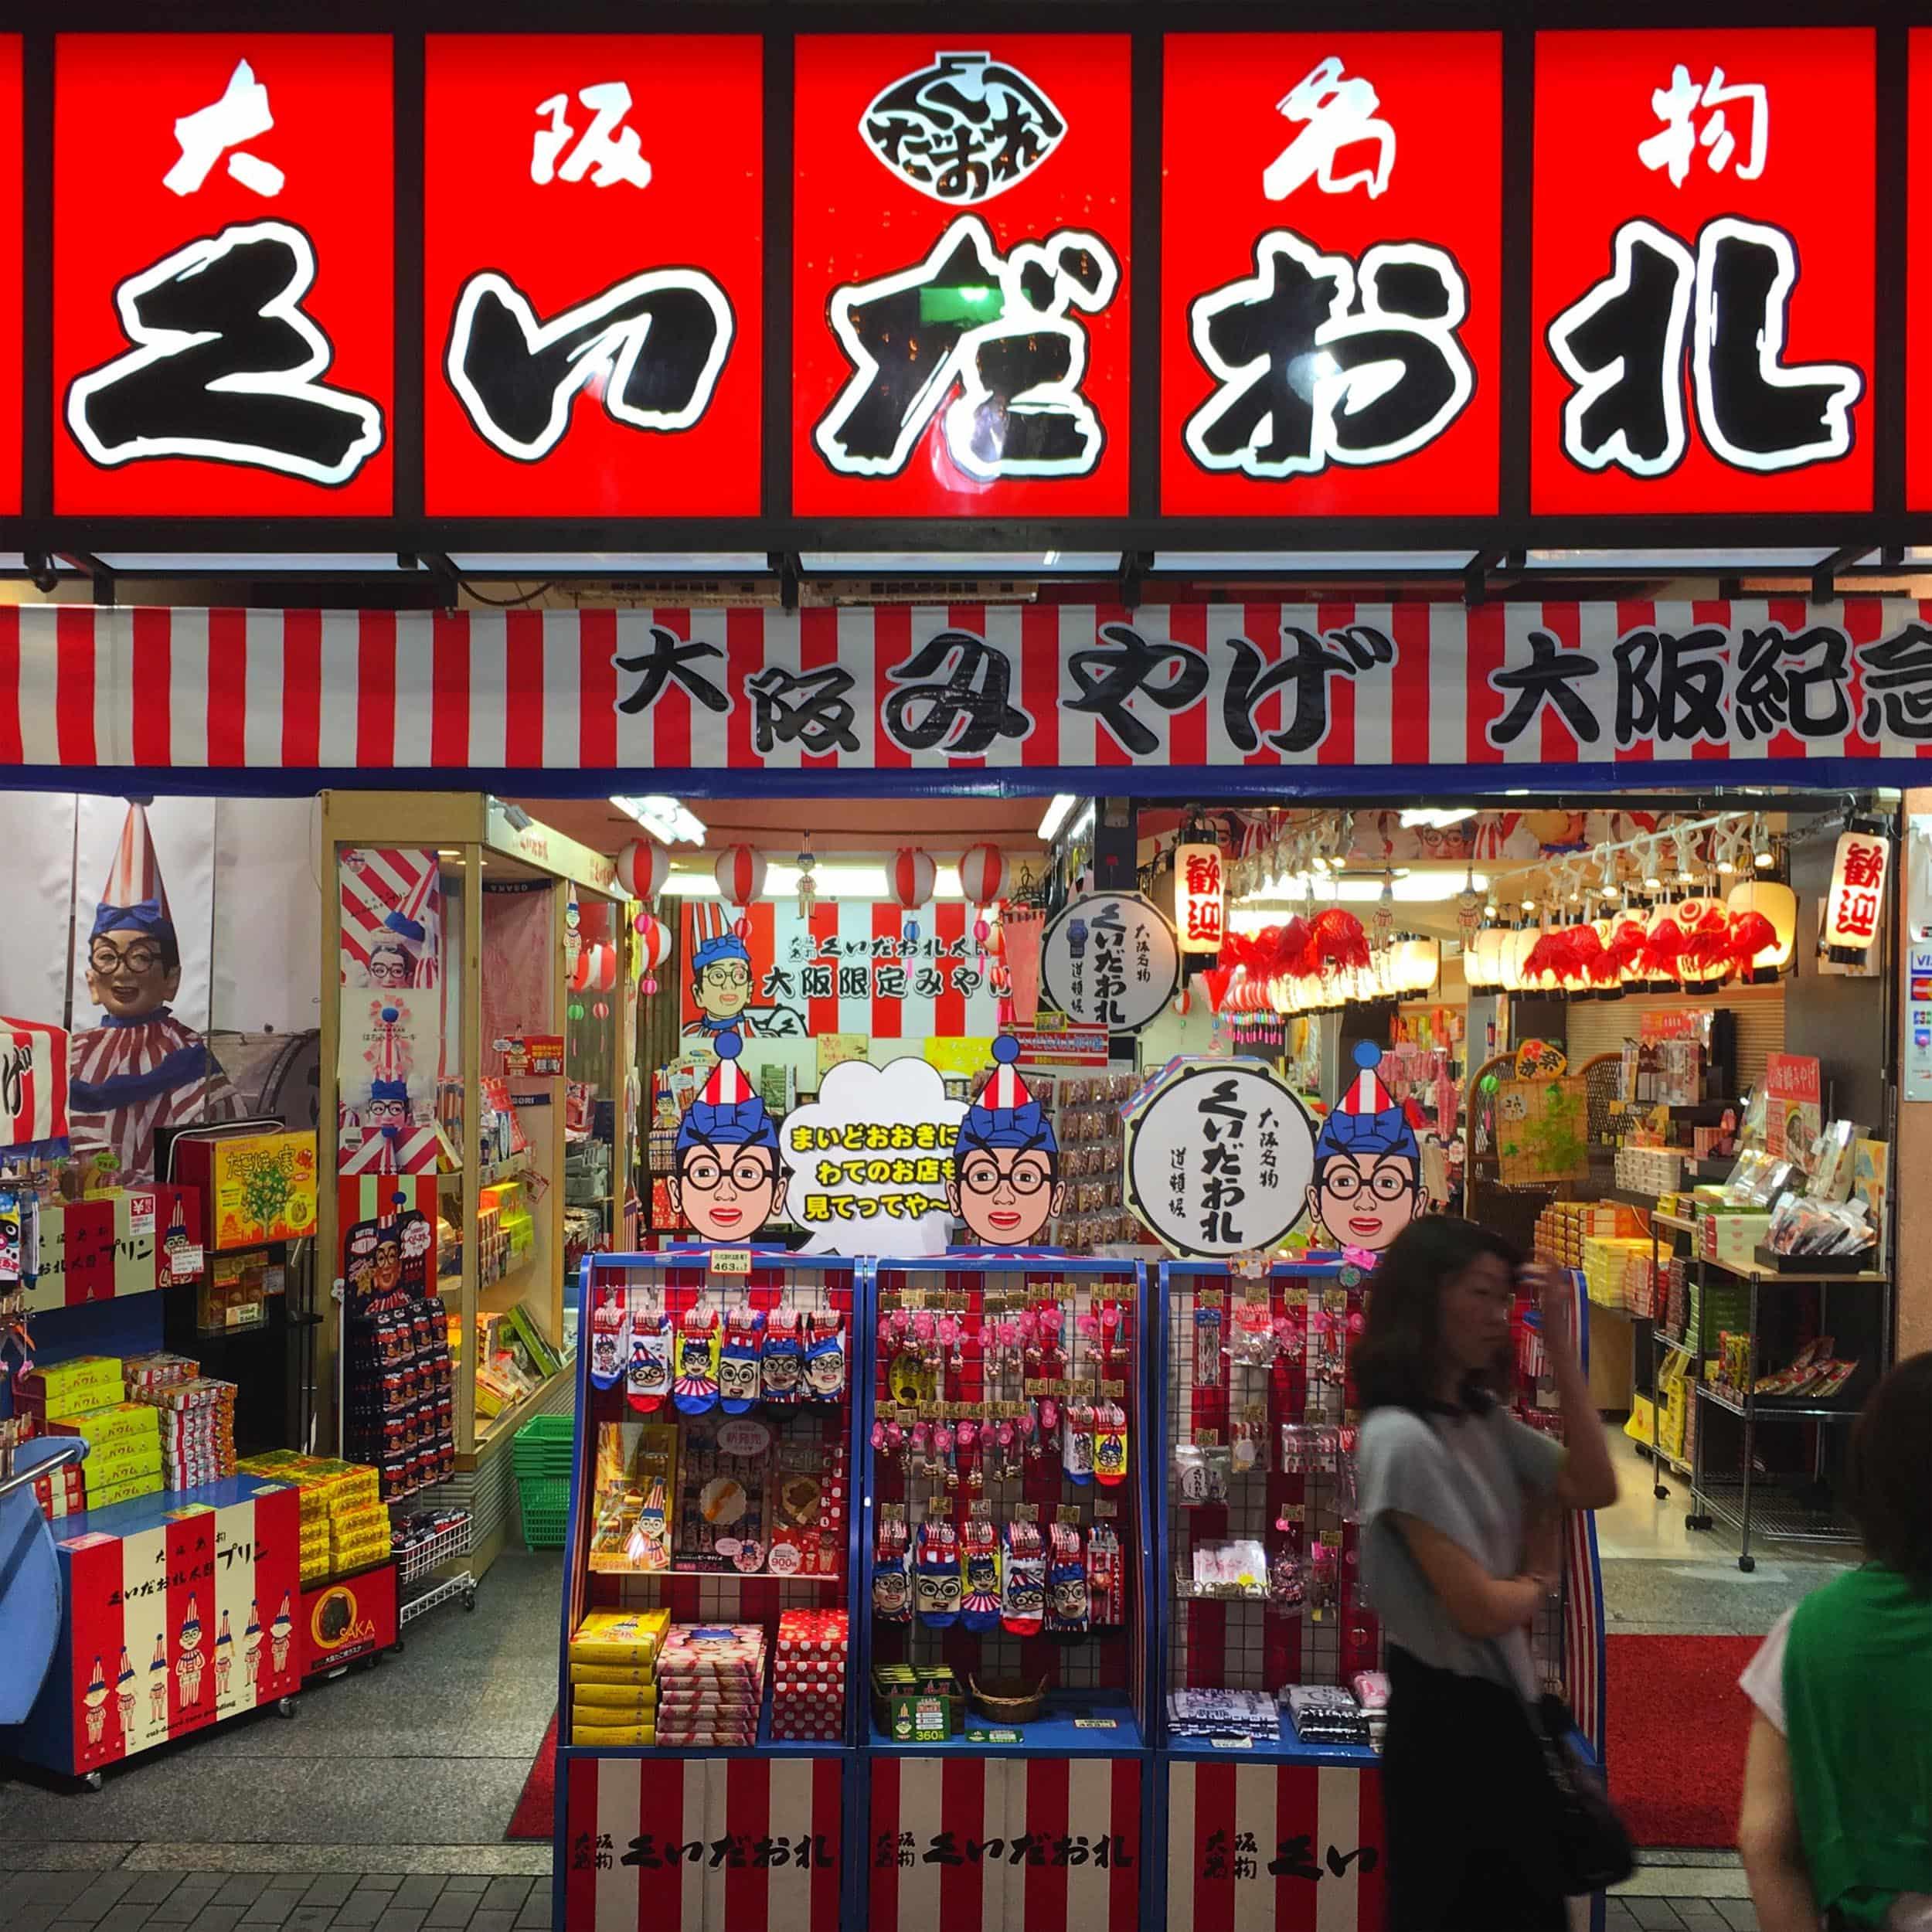 #GROCERY STORE / OSAKA / JAPAN / 2016